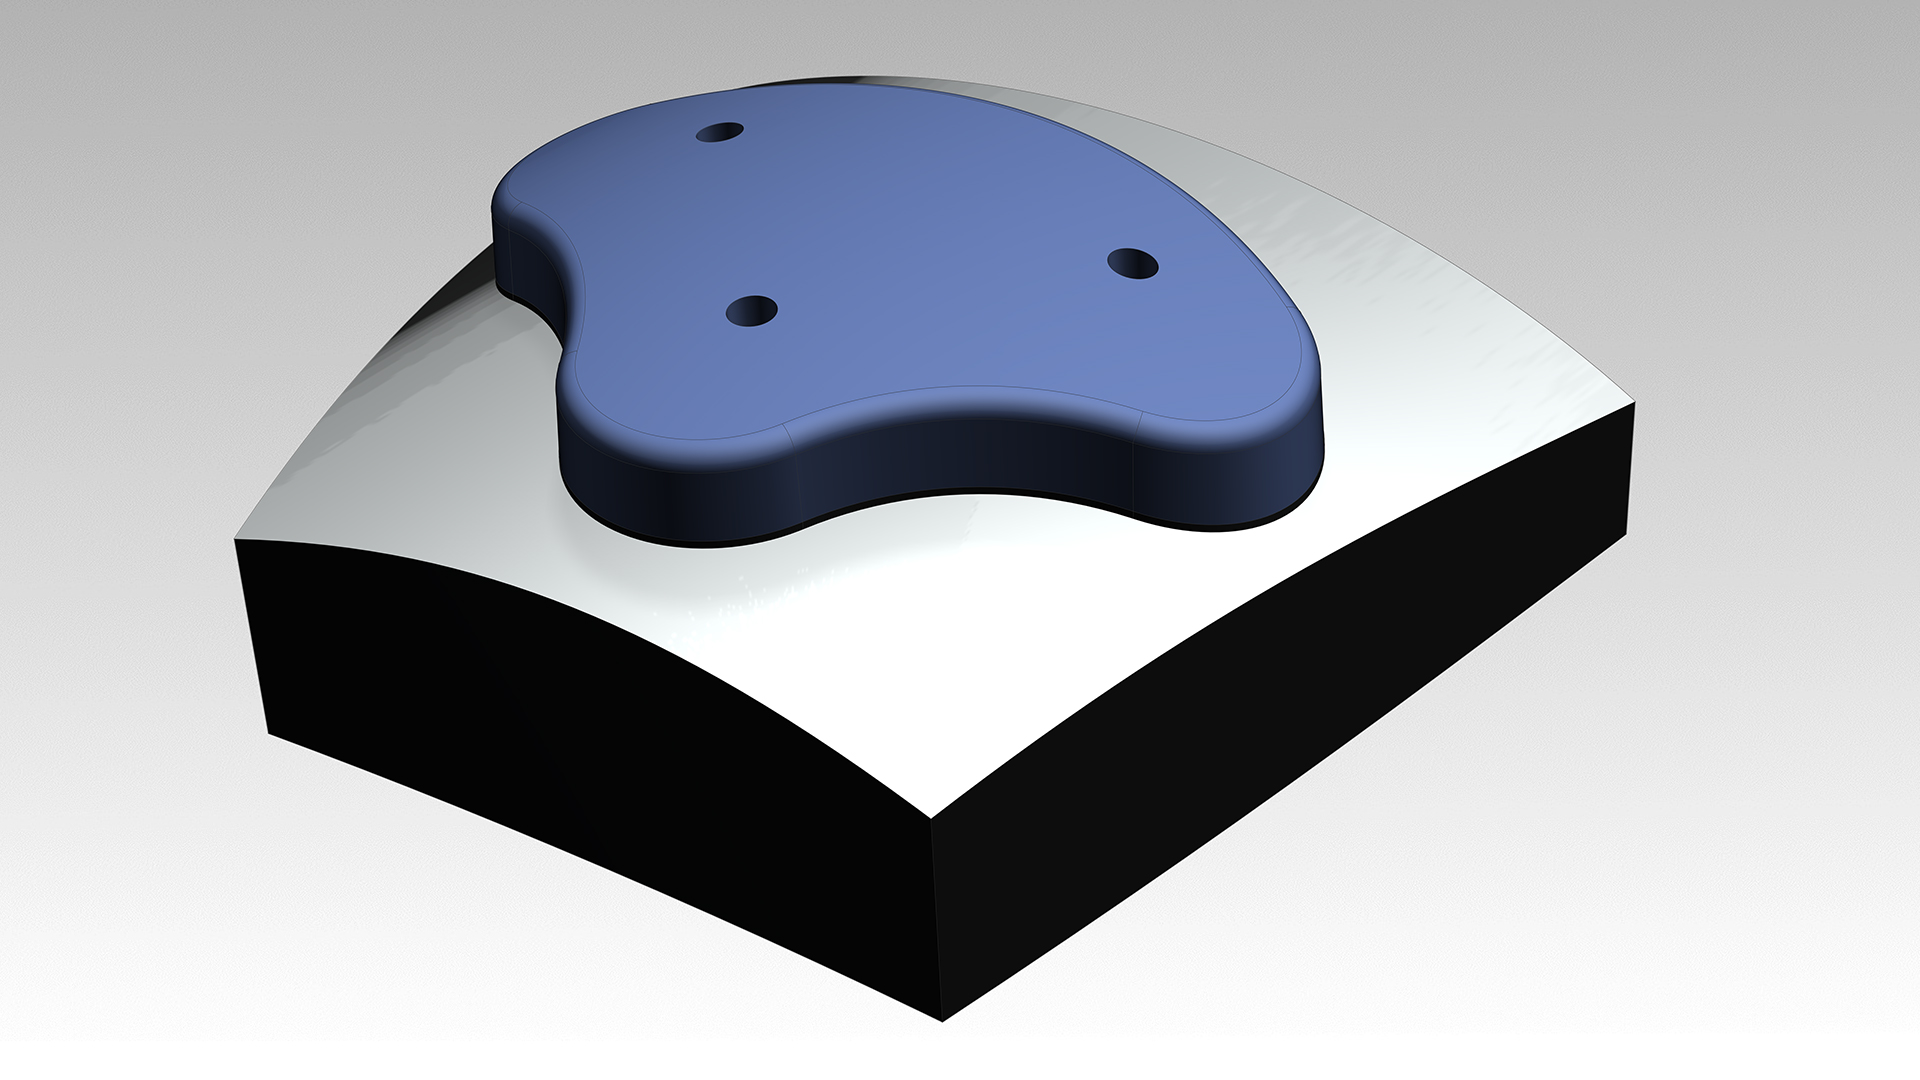 Catia v5 part design tutorial pdf.